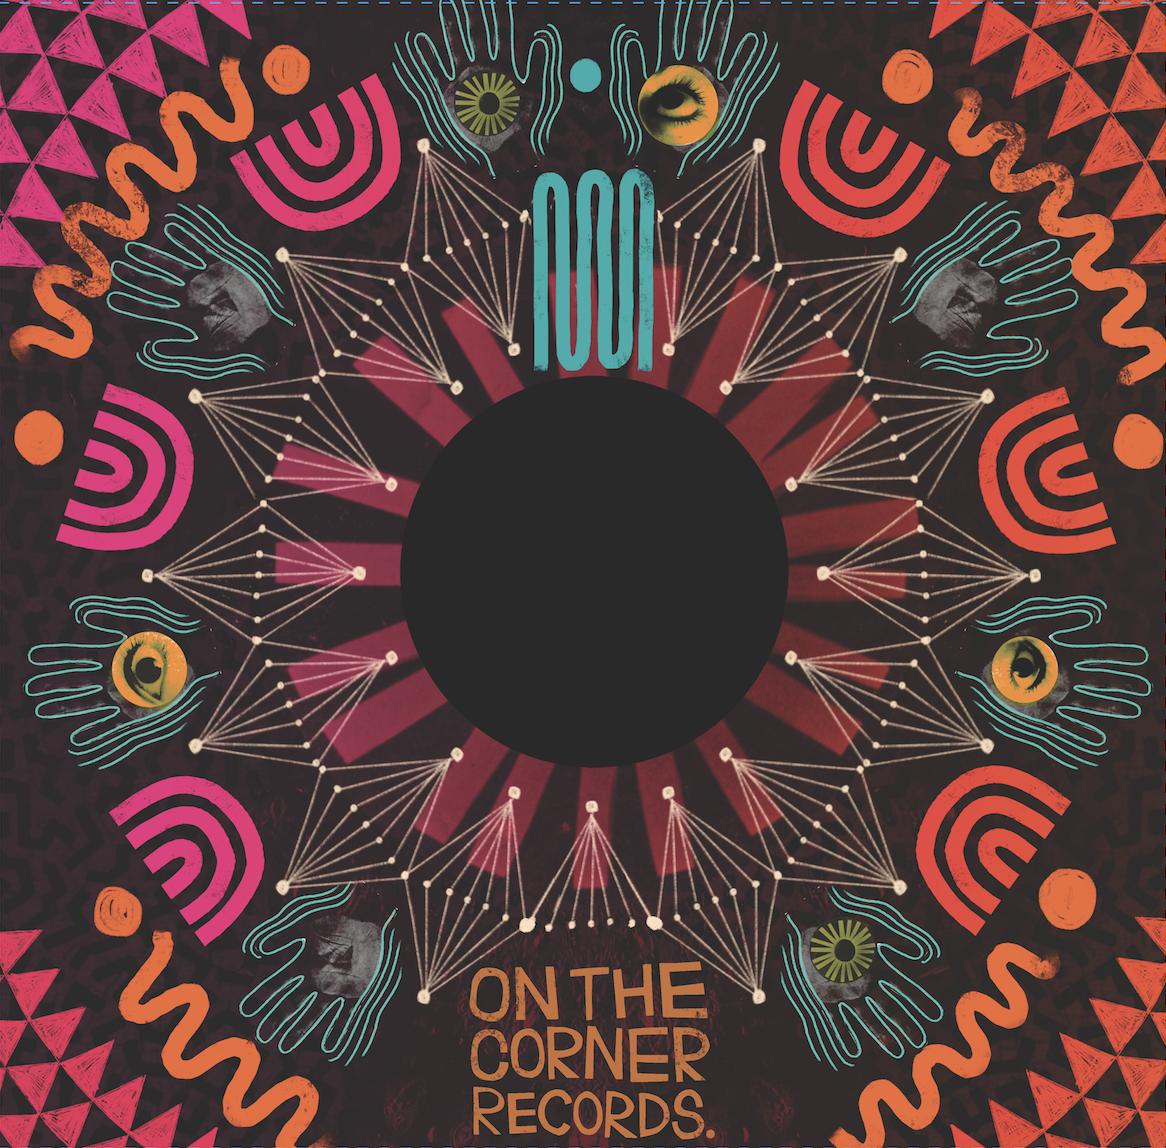 PREMIERE – Penya – Why So Angry (Sarathy Korwar Remix) (On the Corner Records)